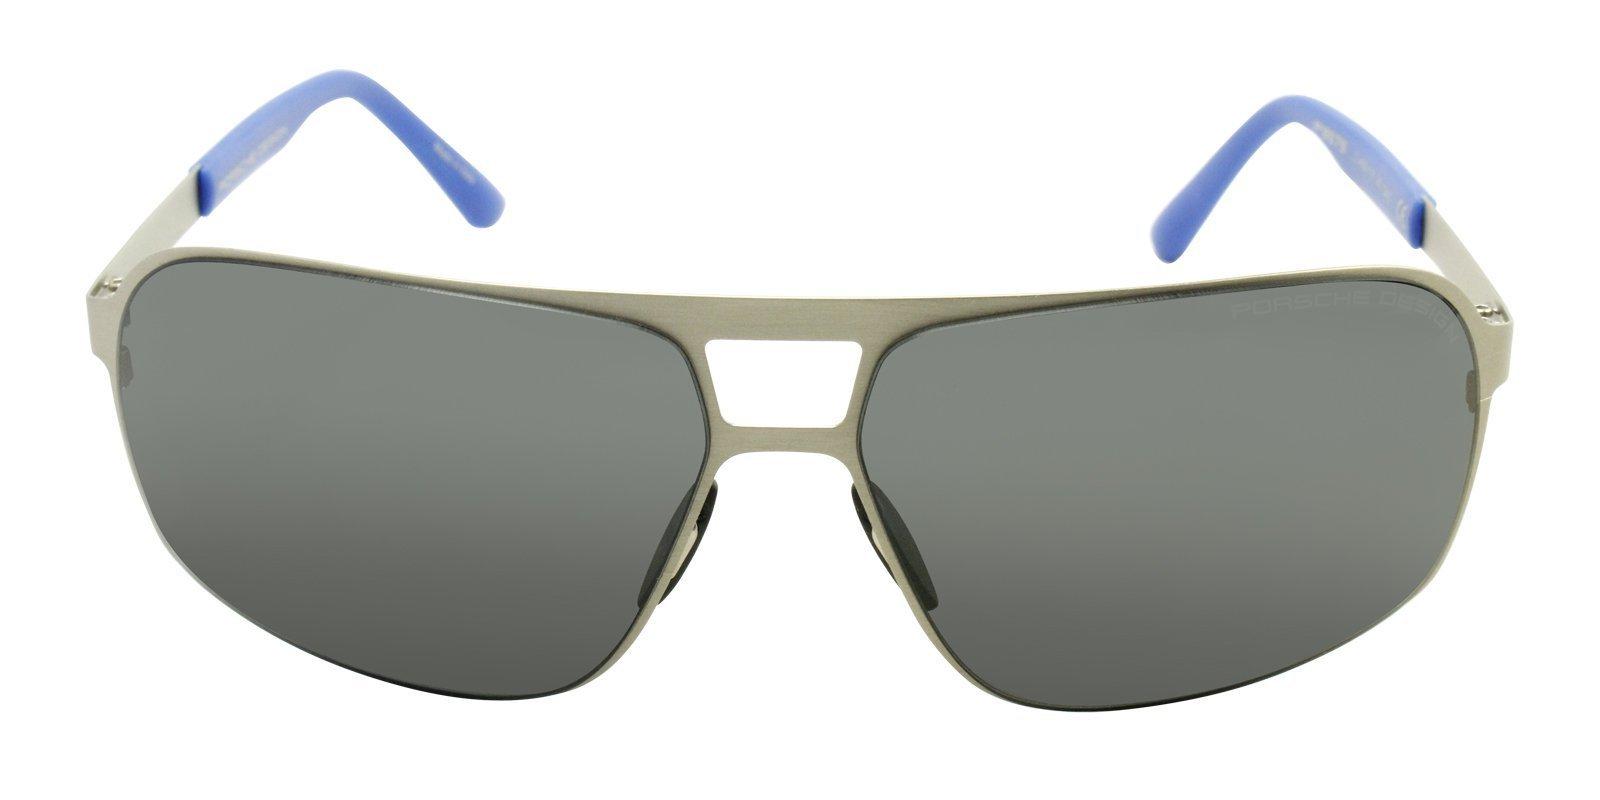 adfb8ab252d Porsche Design - P8579 Gray - Gray. Porsche Design - P8579 Gray - Gray  sunglasses